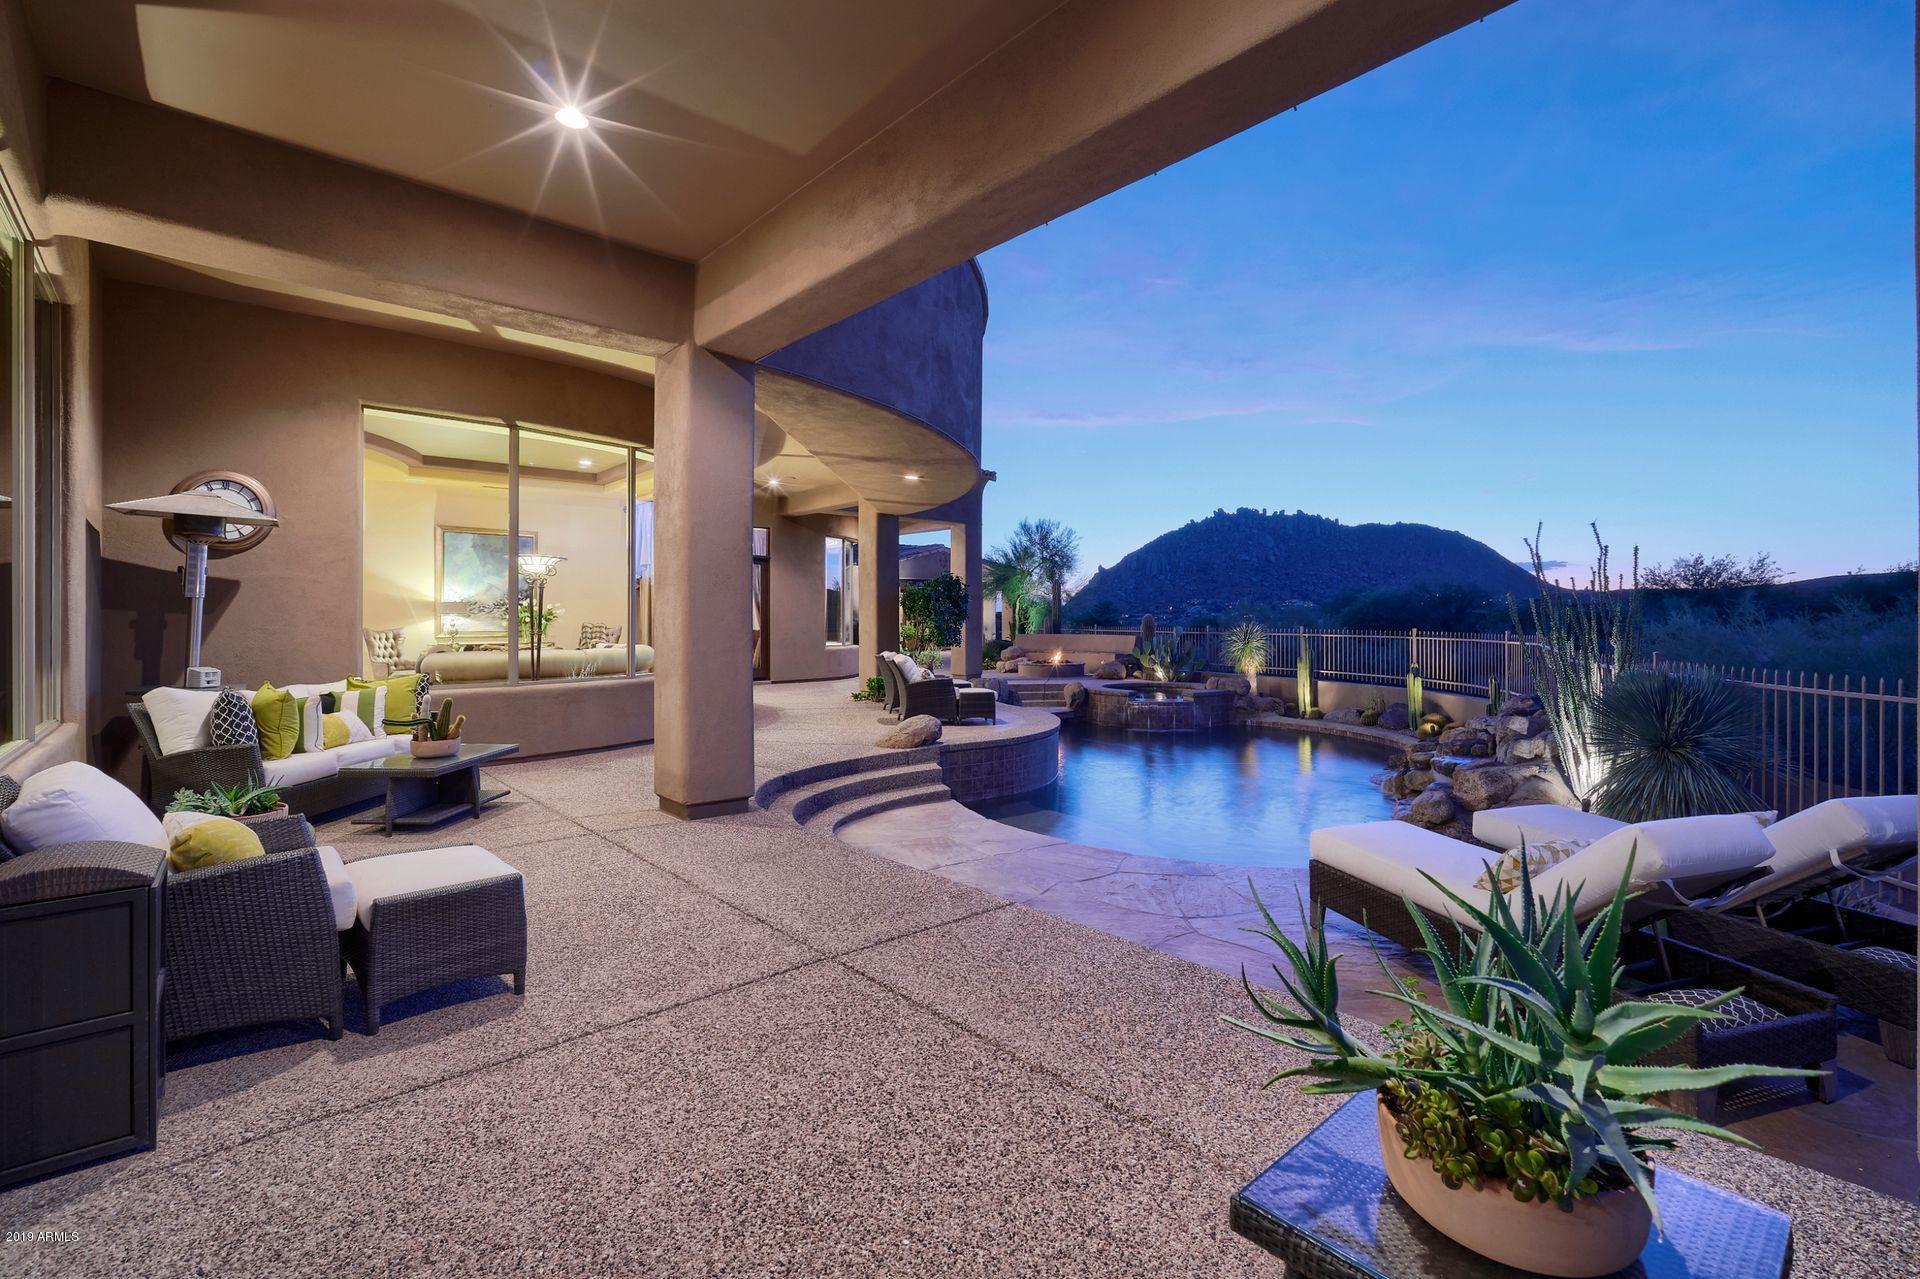 MLS 5969440 12084 E WHISPERING WIND Drive, Scottsdale, AZ 85255 Scottsdale AZ Private Pool